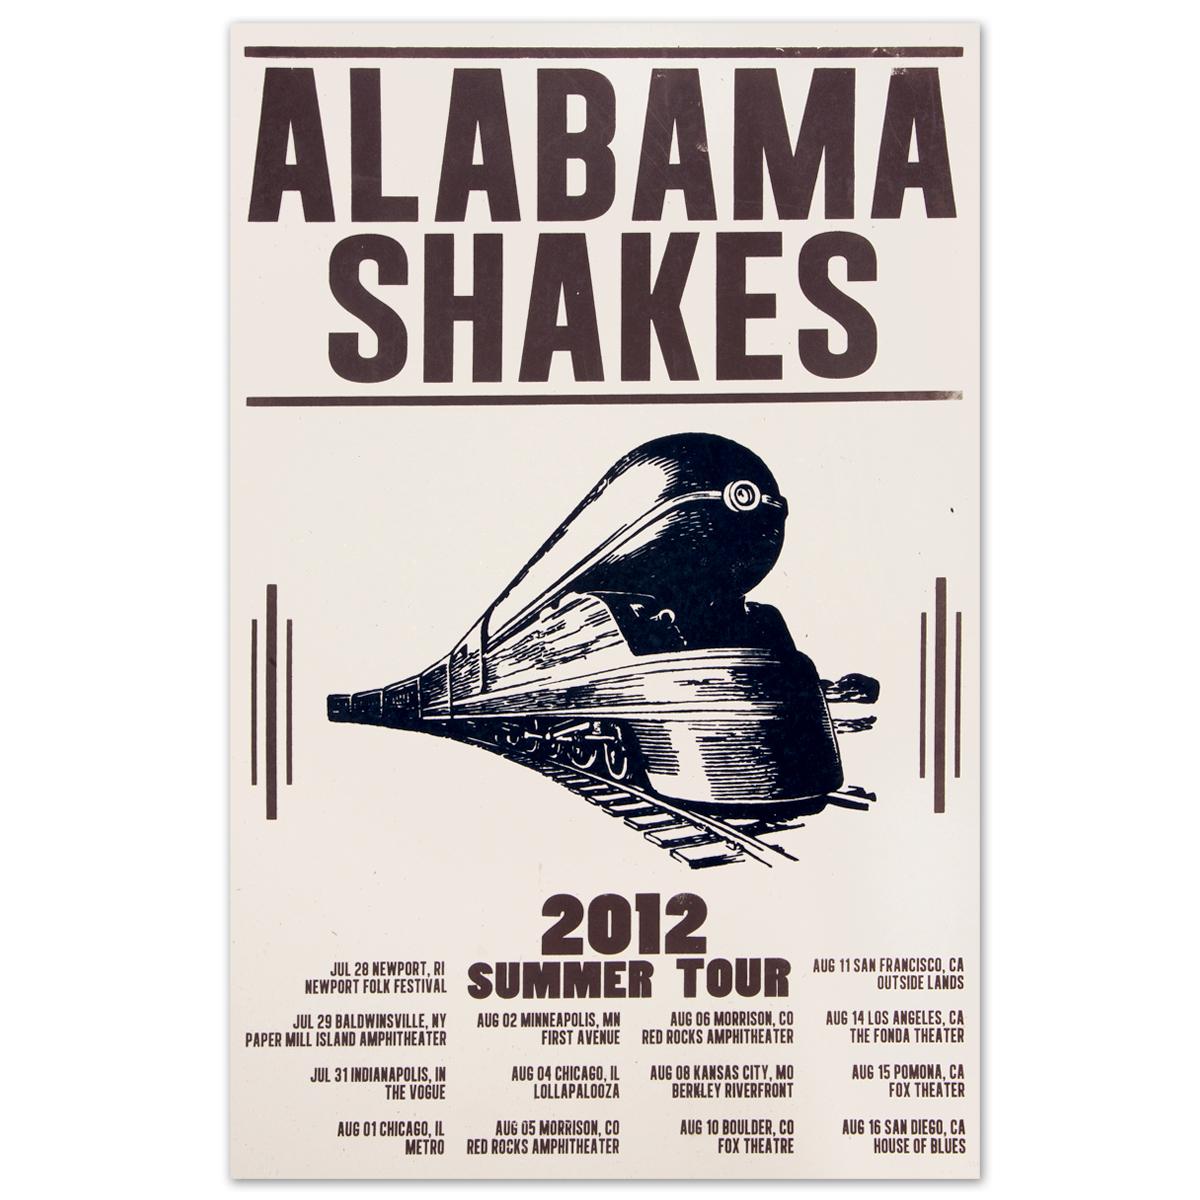 Alabama Shakes Summer 2012 Tour Poster